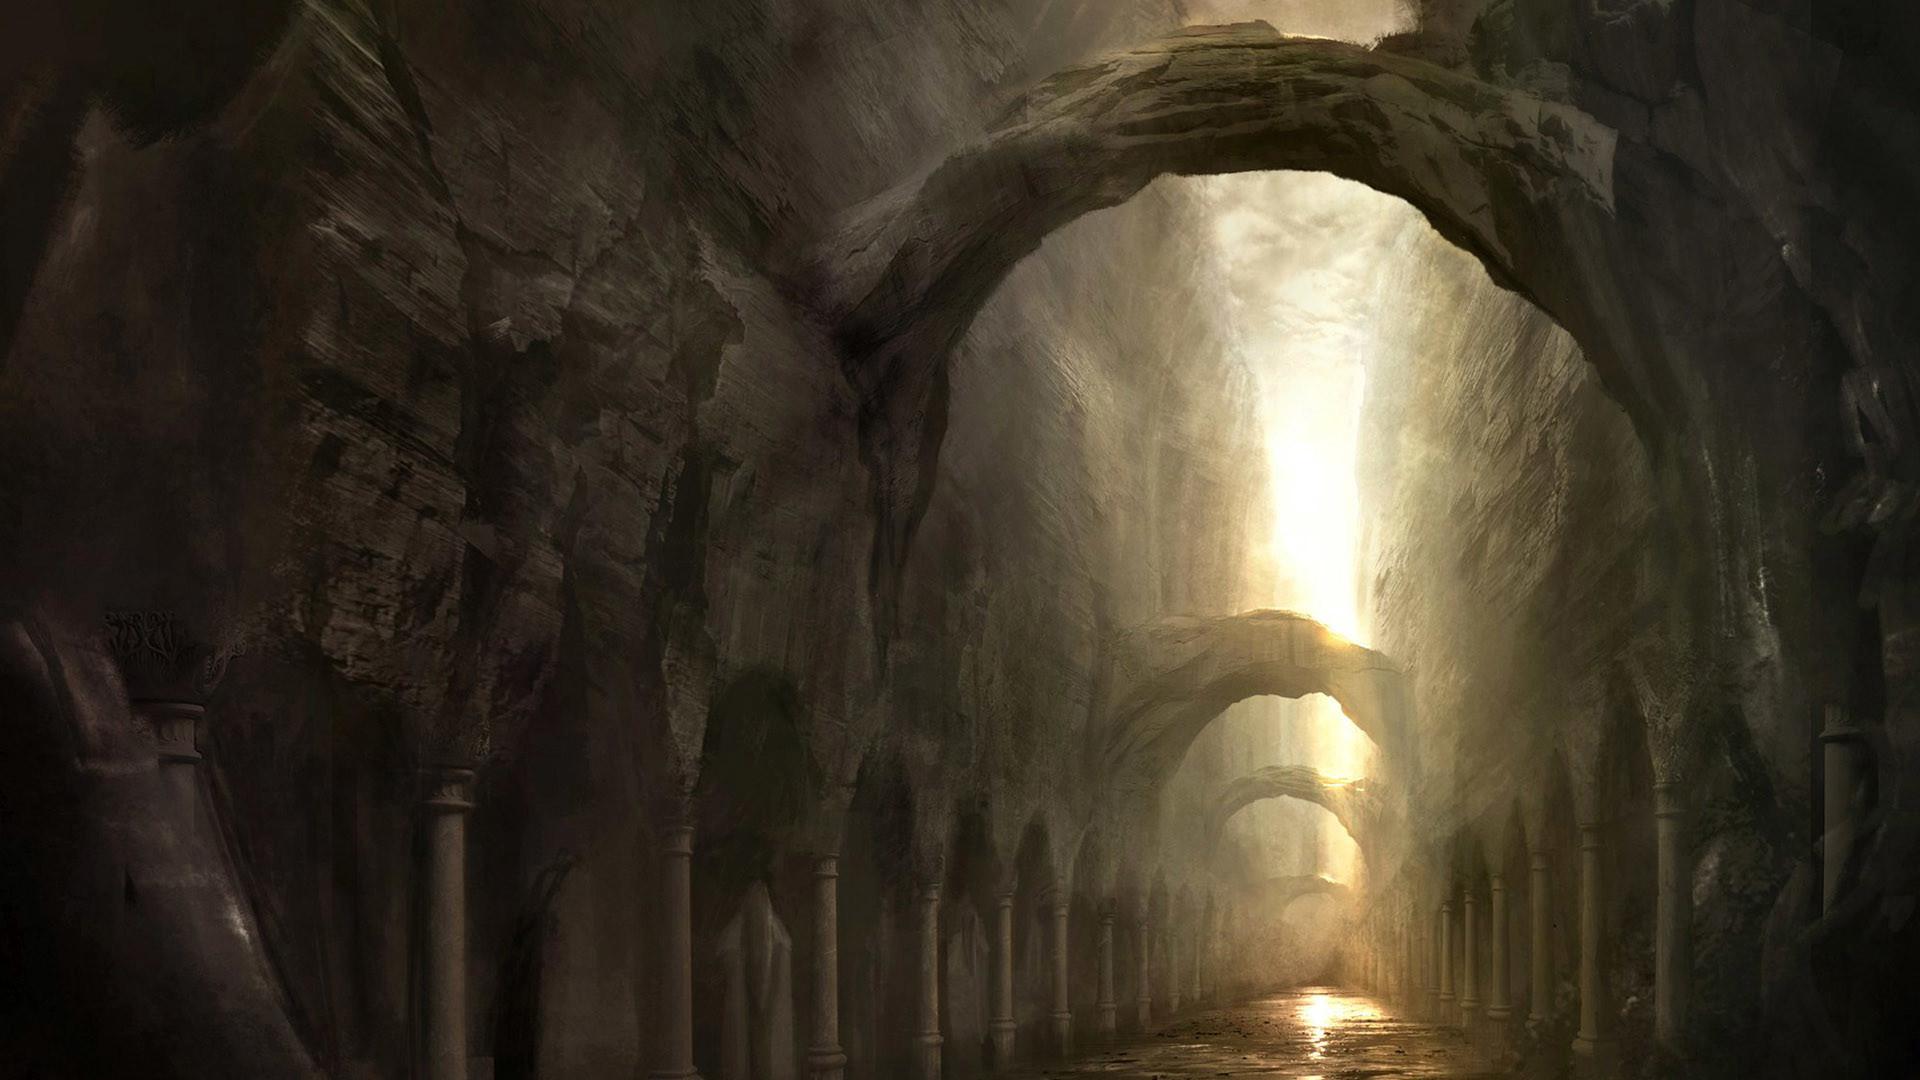 High resolution gothic / dark art desktop wallpaper of Fantasy Places HD  (ID: